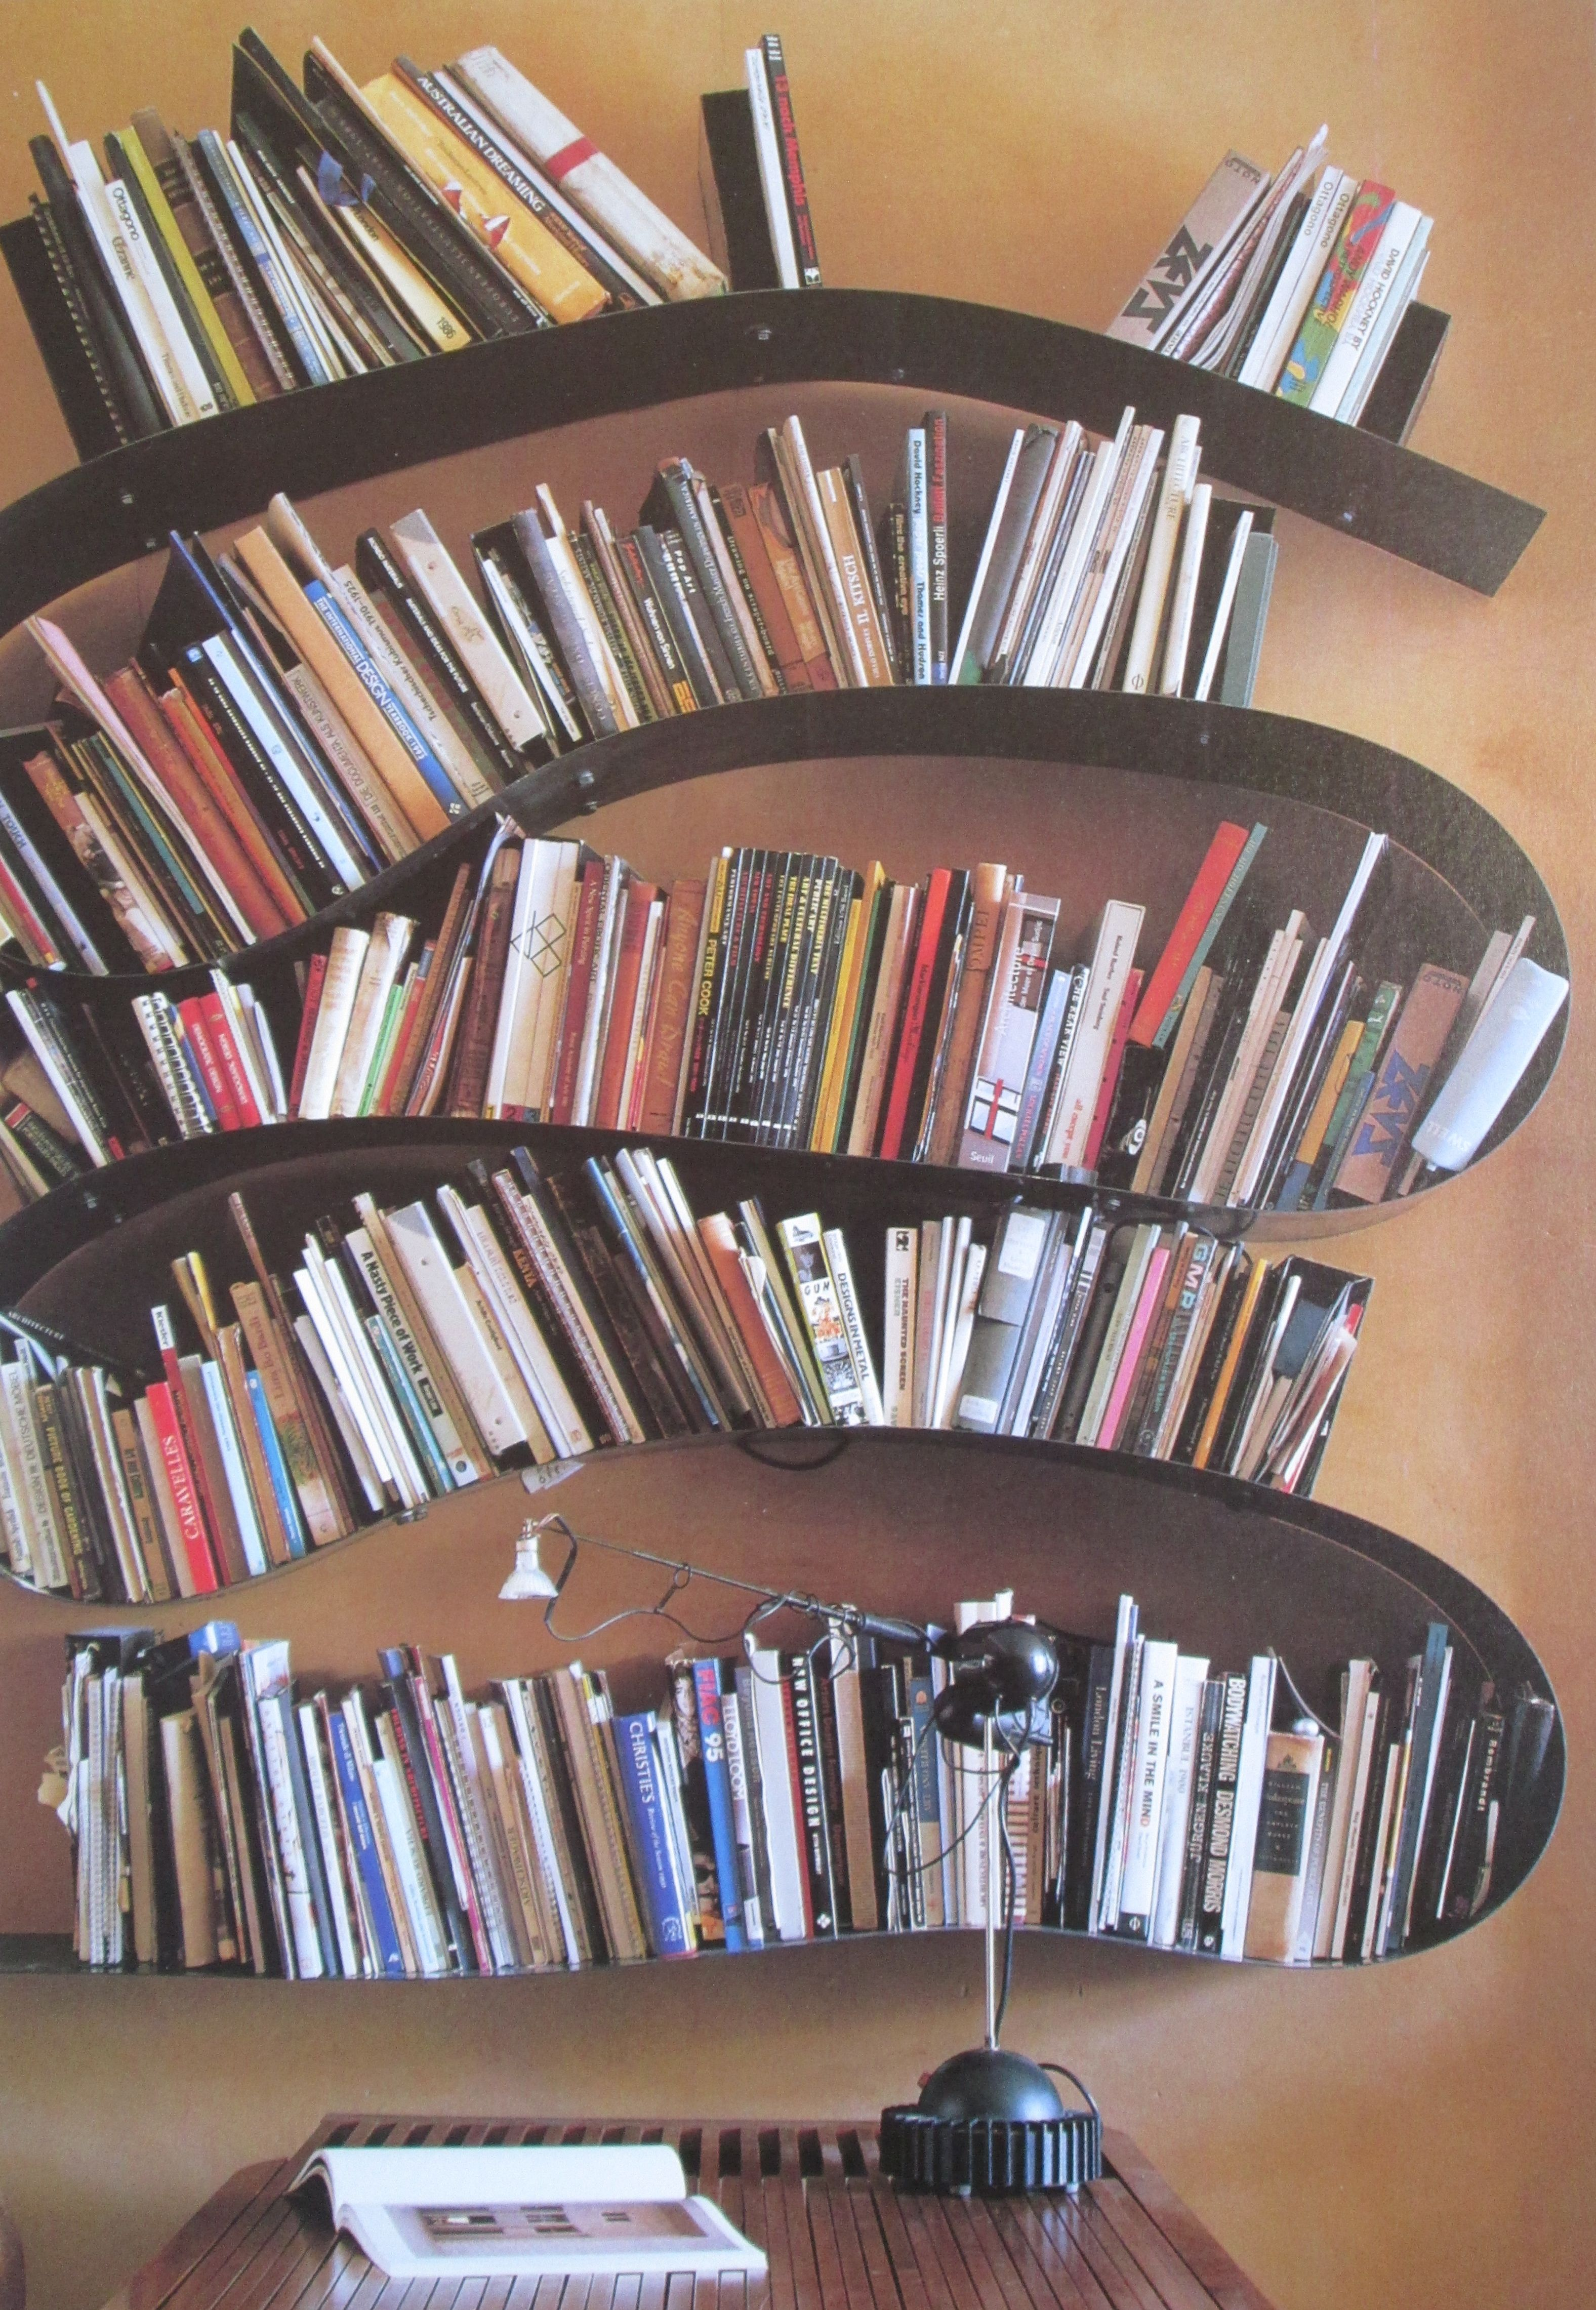 Bookworm, Ron Arad Kartell